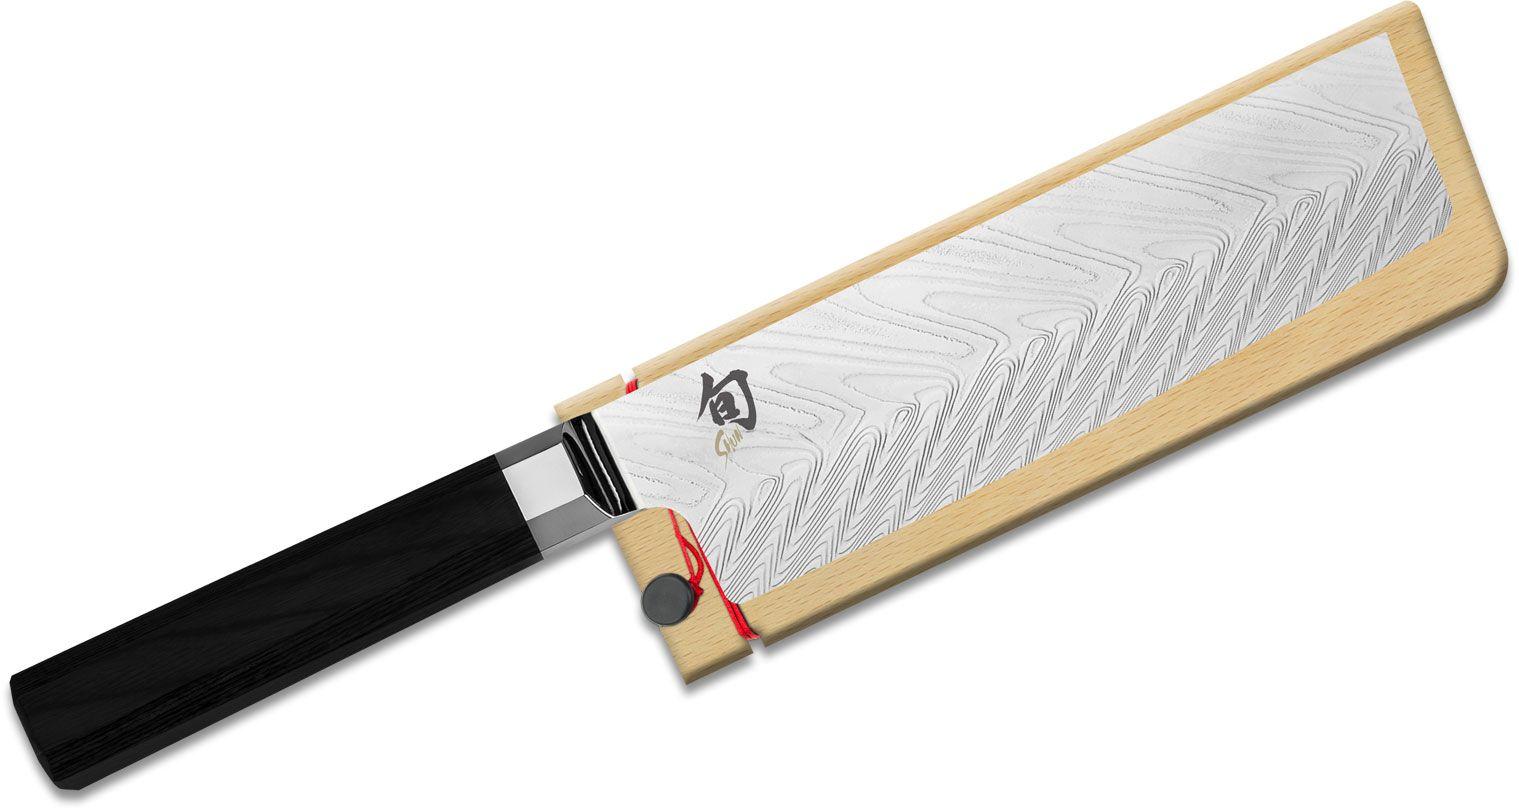 Shun VG0028 Dual Core Nakiri Knife 6.5 inch Damascus Blade, Ebony PakkaWood Handle, Wooden Sheath